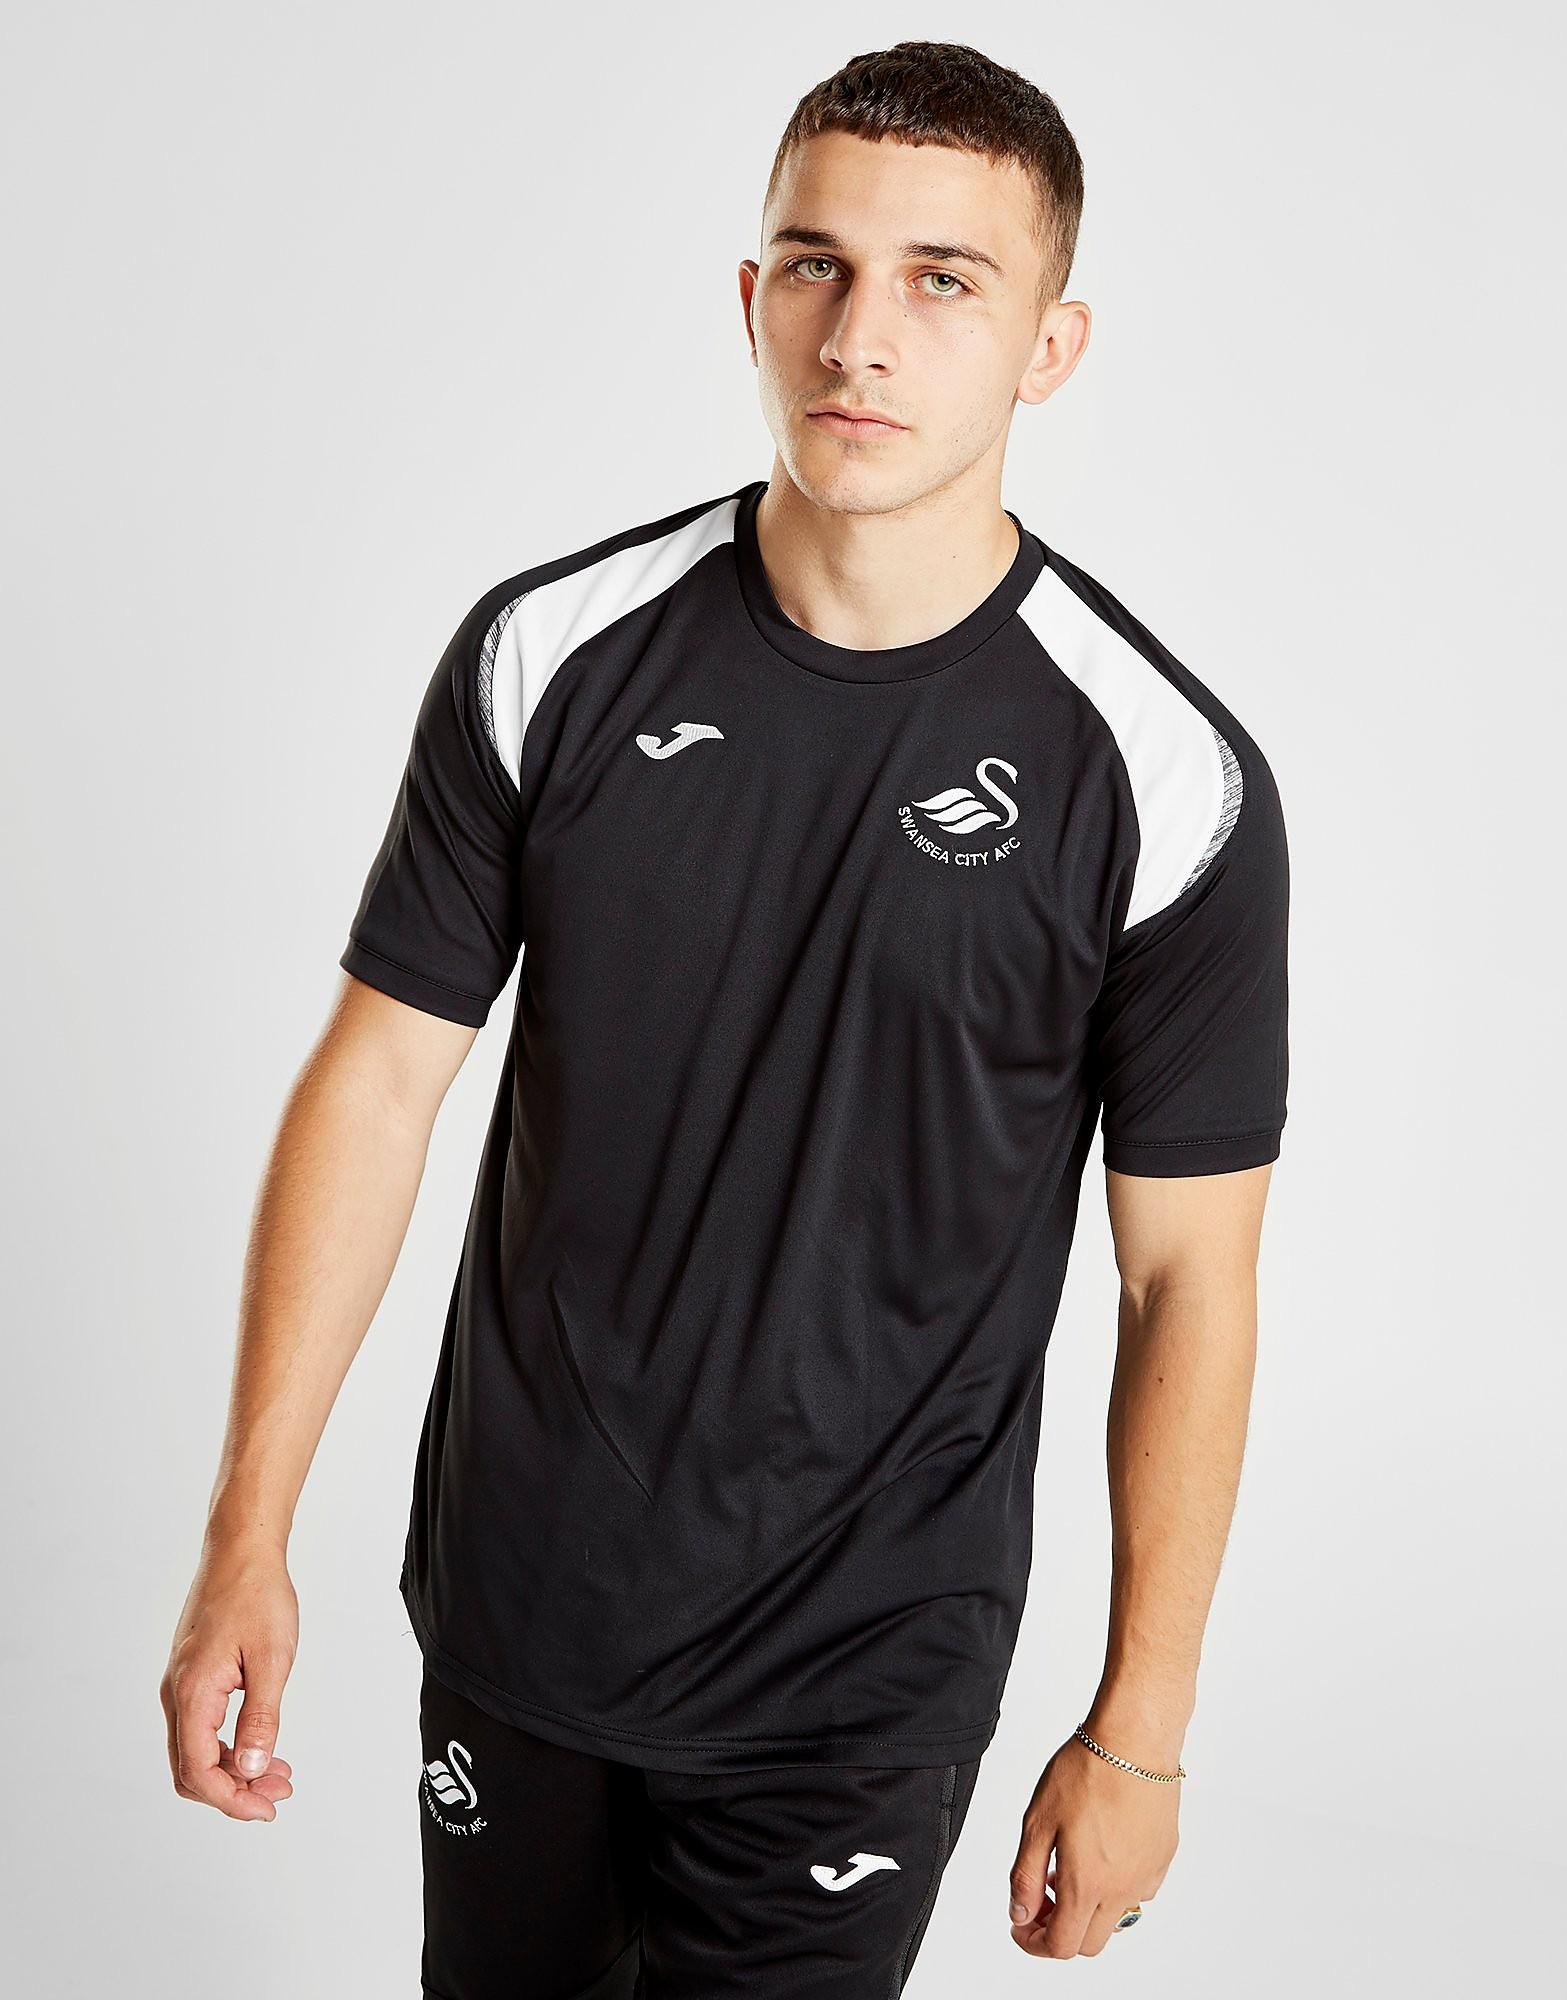 Joma Swansea City FC 2018/19 Training Shirt